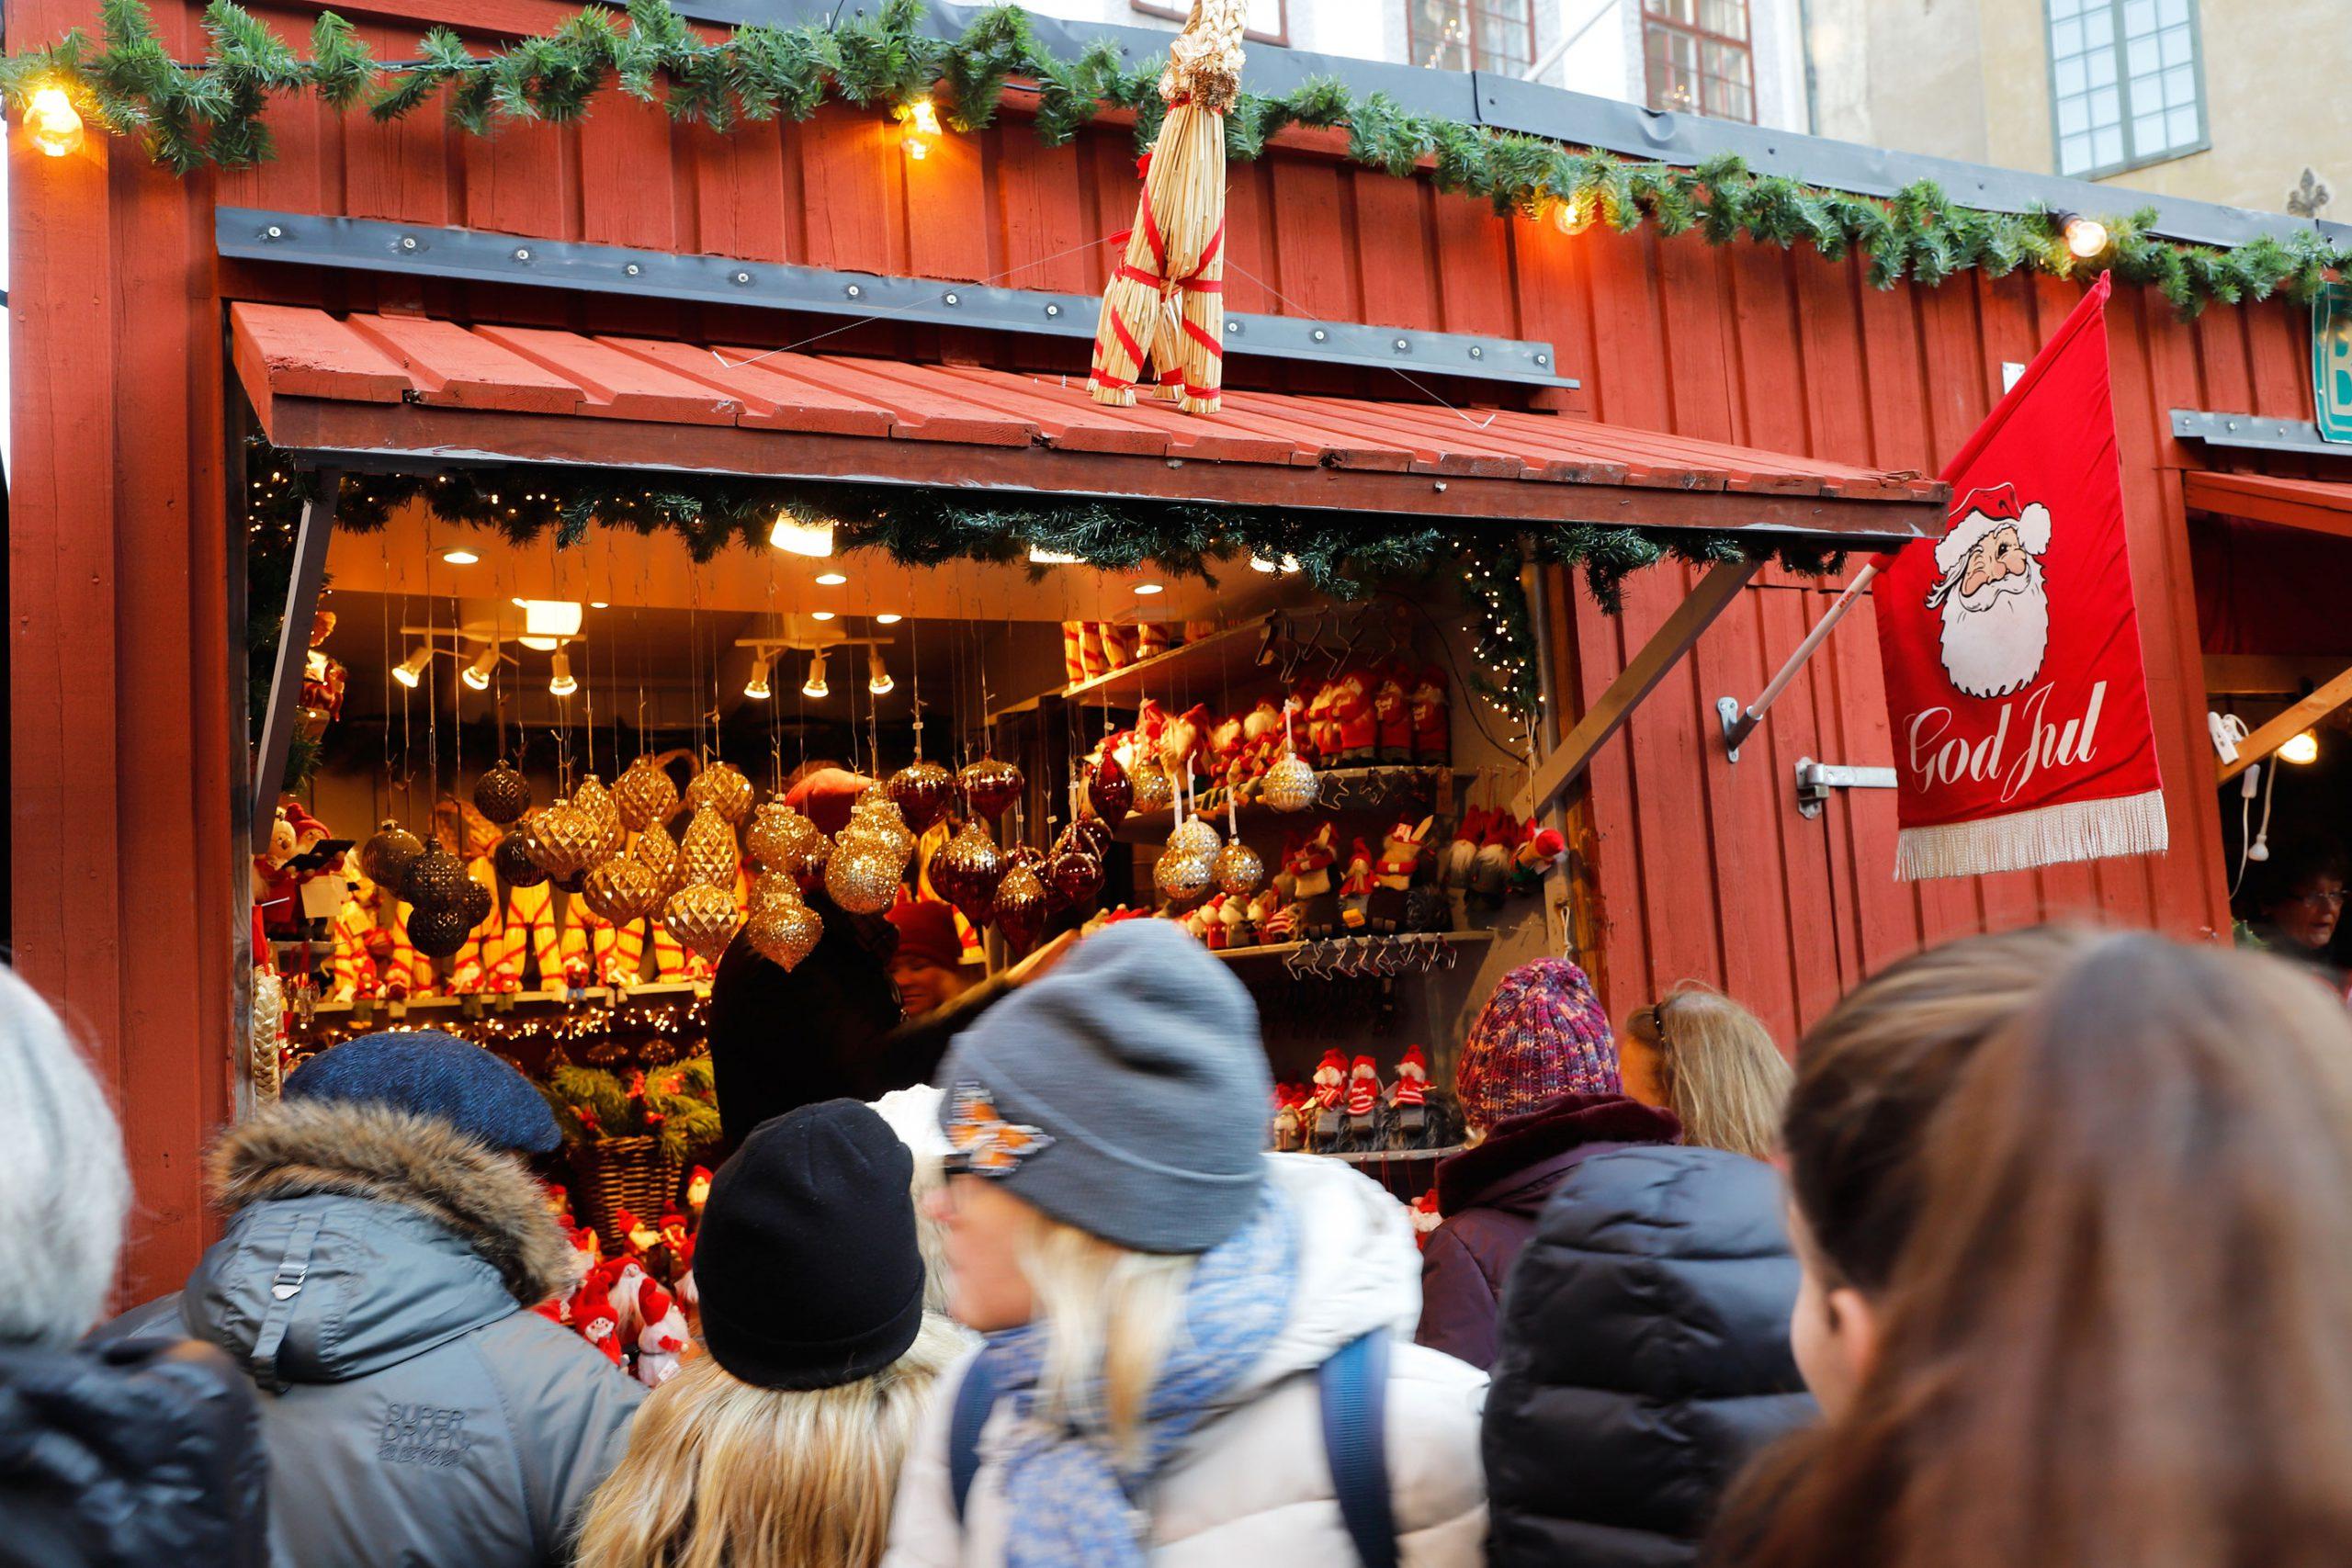 boder julemarked utvalg Stockholm Gamla Stan